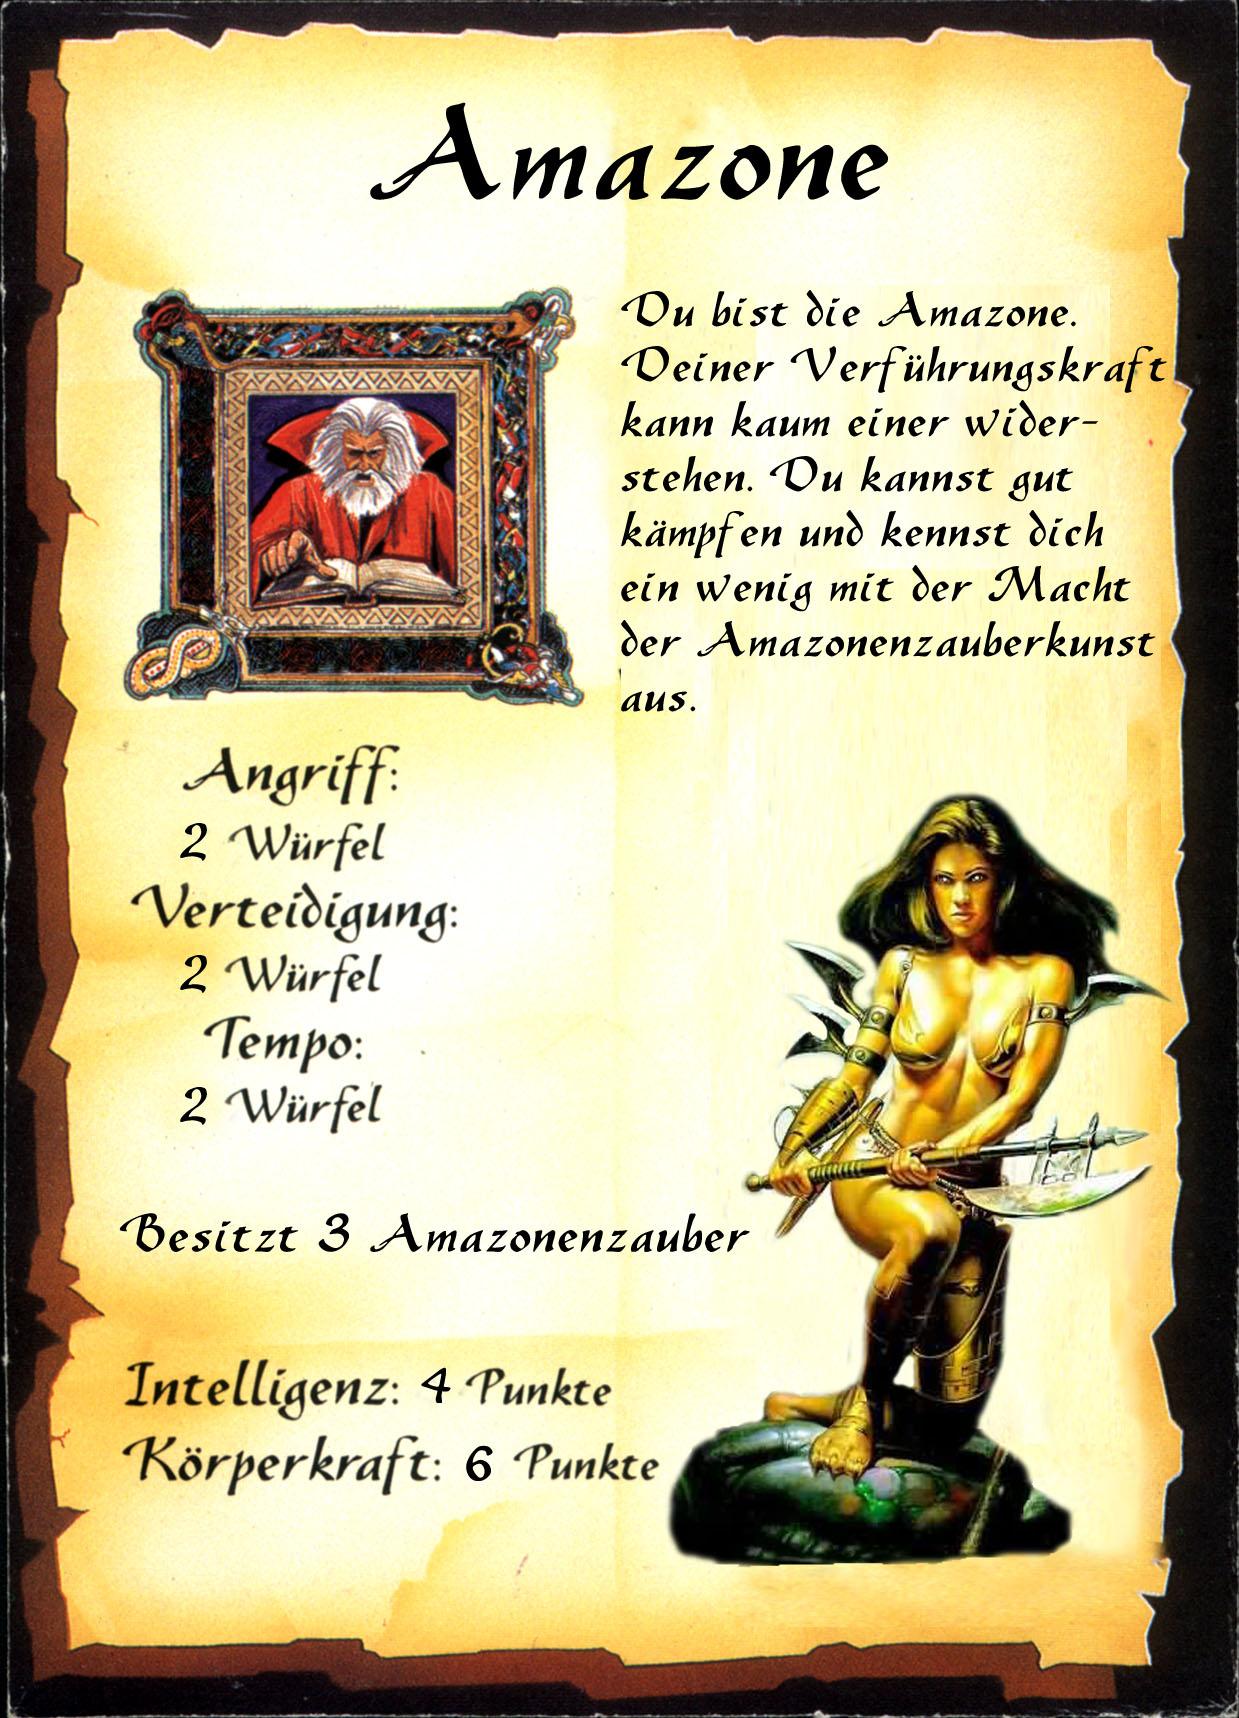 http://www.hq-cooperation.de/content/zubehoer/charaktere/amazone/amazone_charakter.jpg